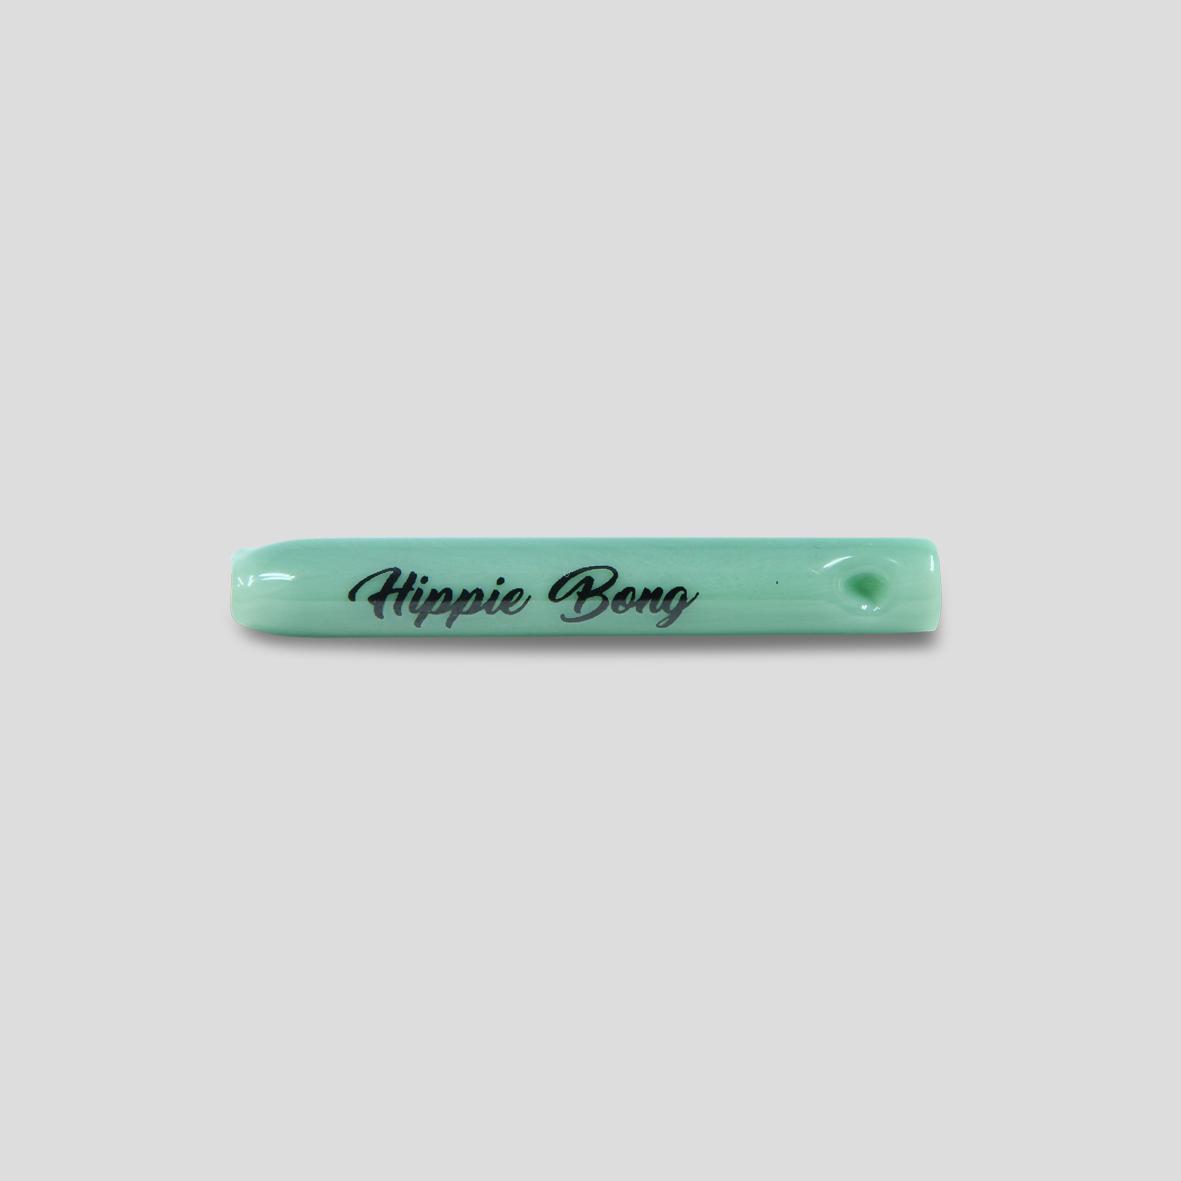 Piteira de vidro colorida - Alchemy Mint